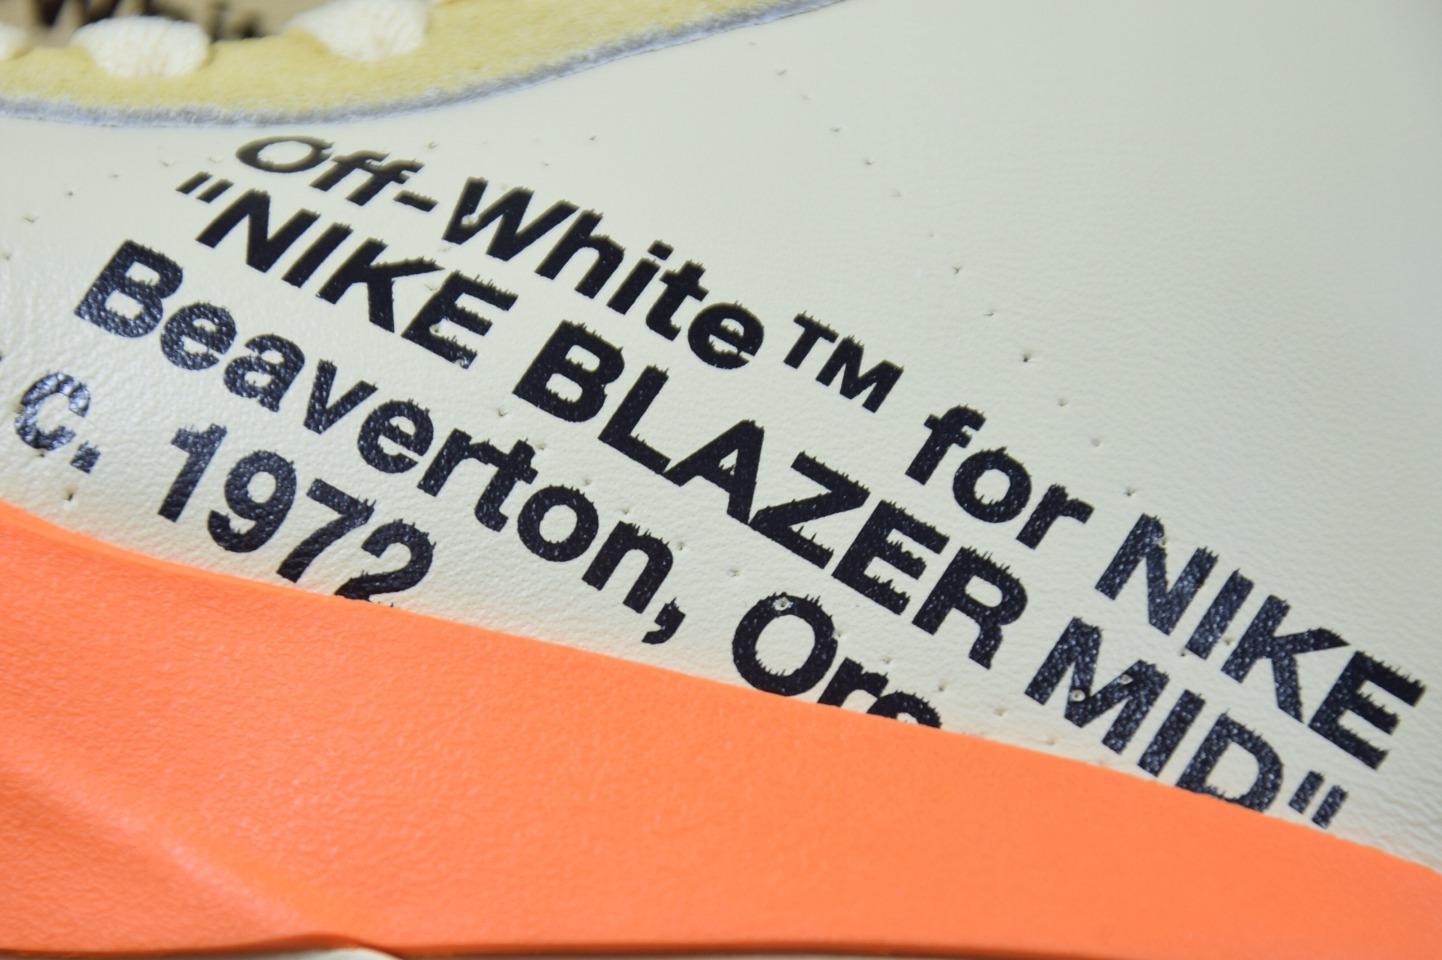 OFF-WHITE X NK  BLAZER MID Grim Reaper  万圣节南瓜OW联名开拓者AA3832-700_椰子350v2 g5